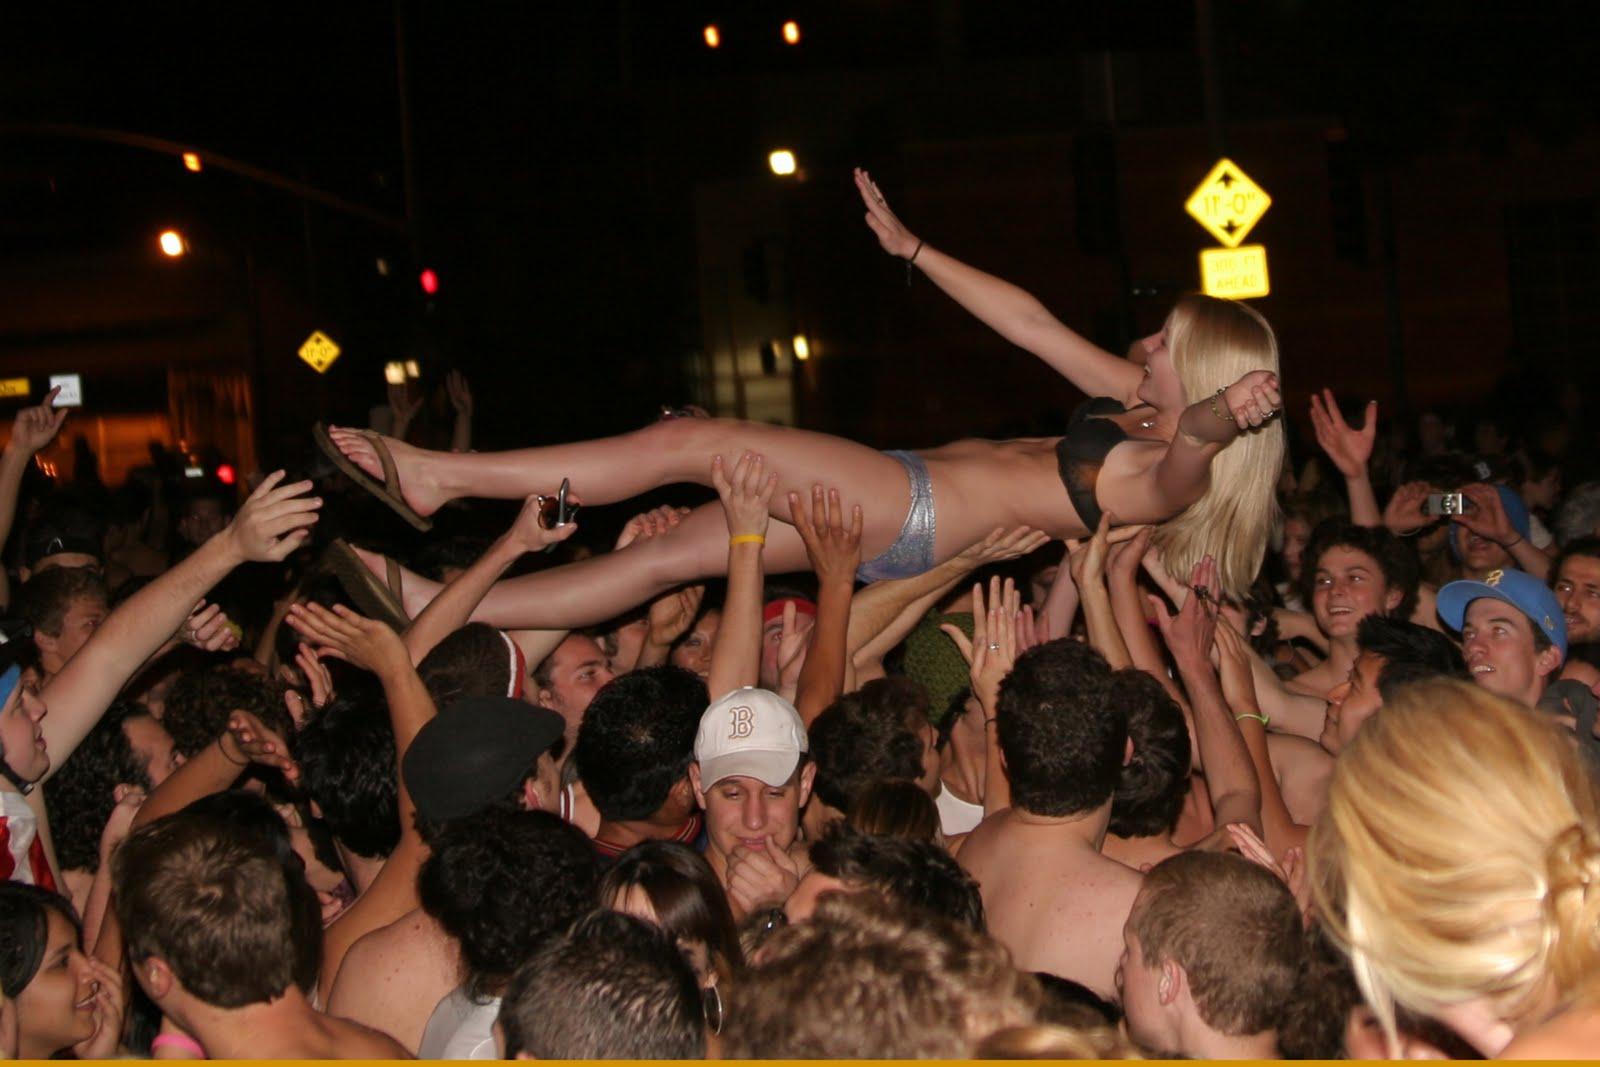 hot skinhead girls nude